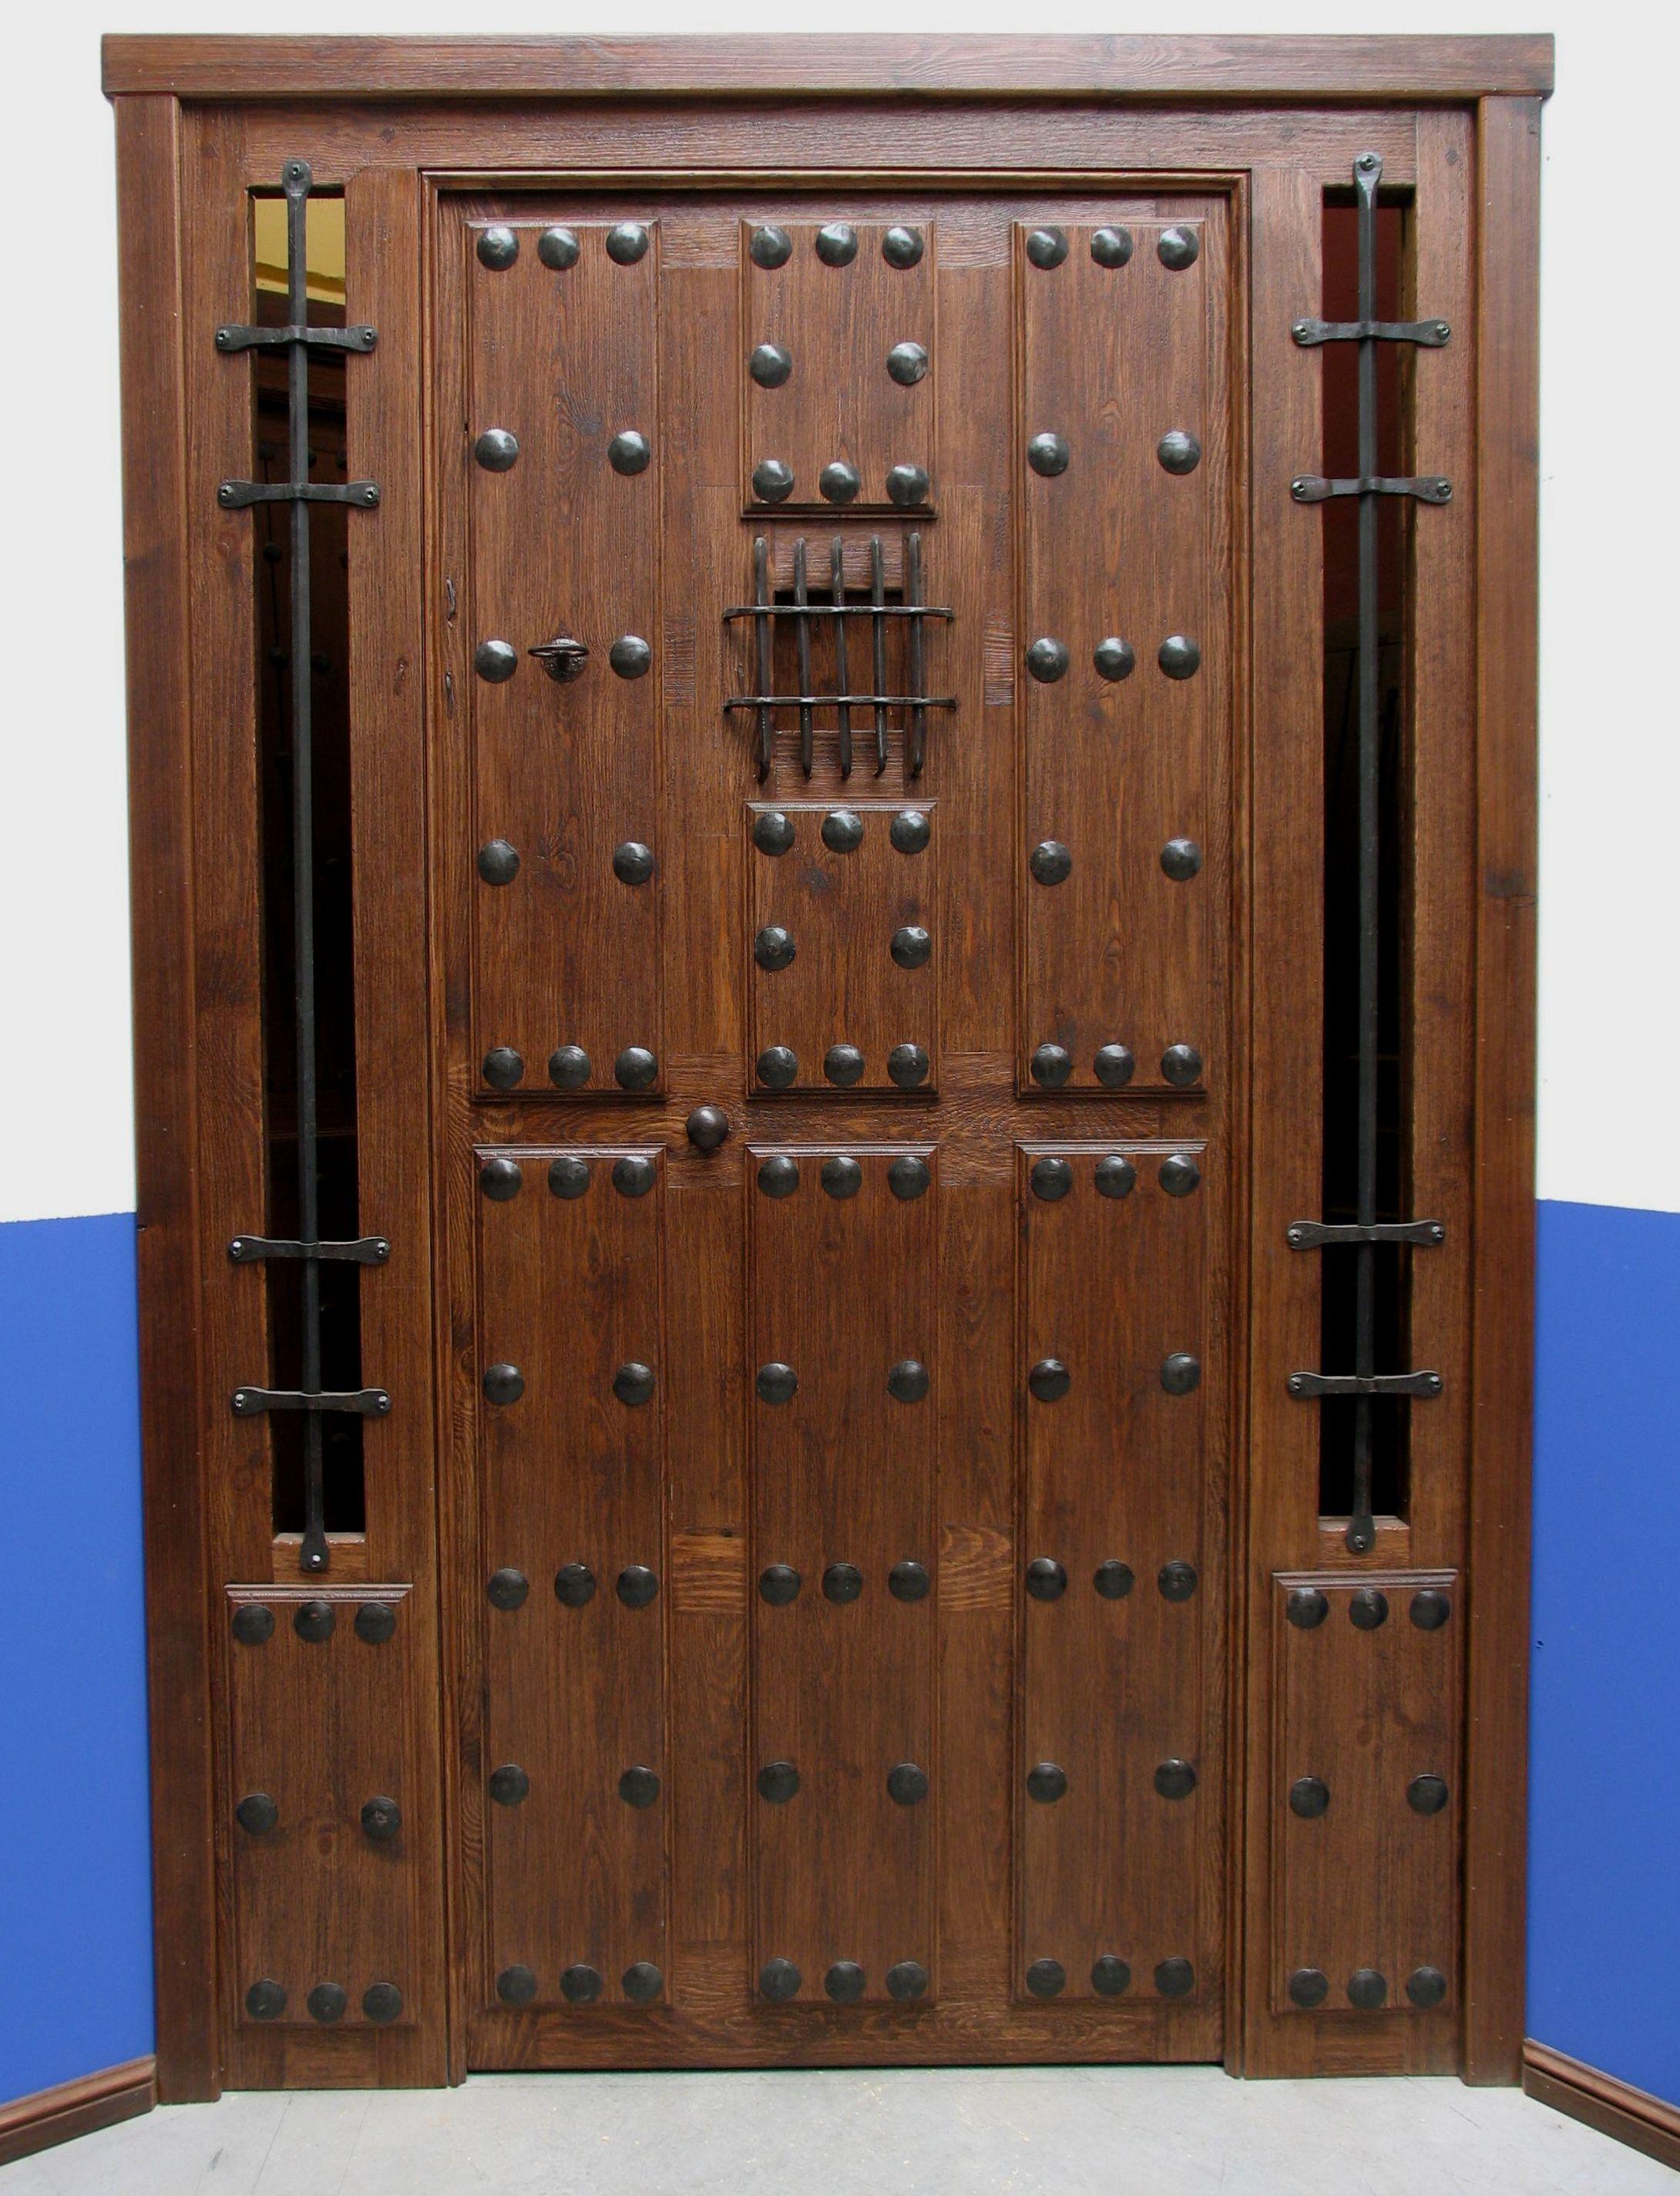 Puerta rustica ref 74 09 puertas chulas - Puerta madera rustica ...